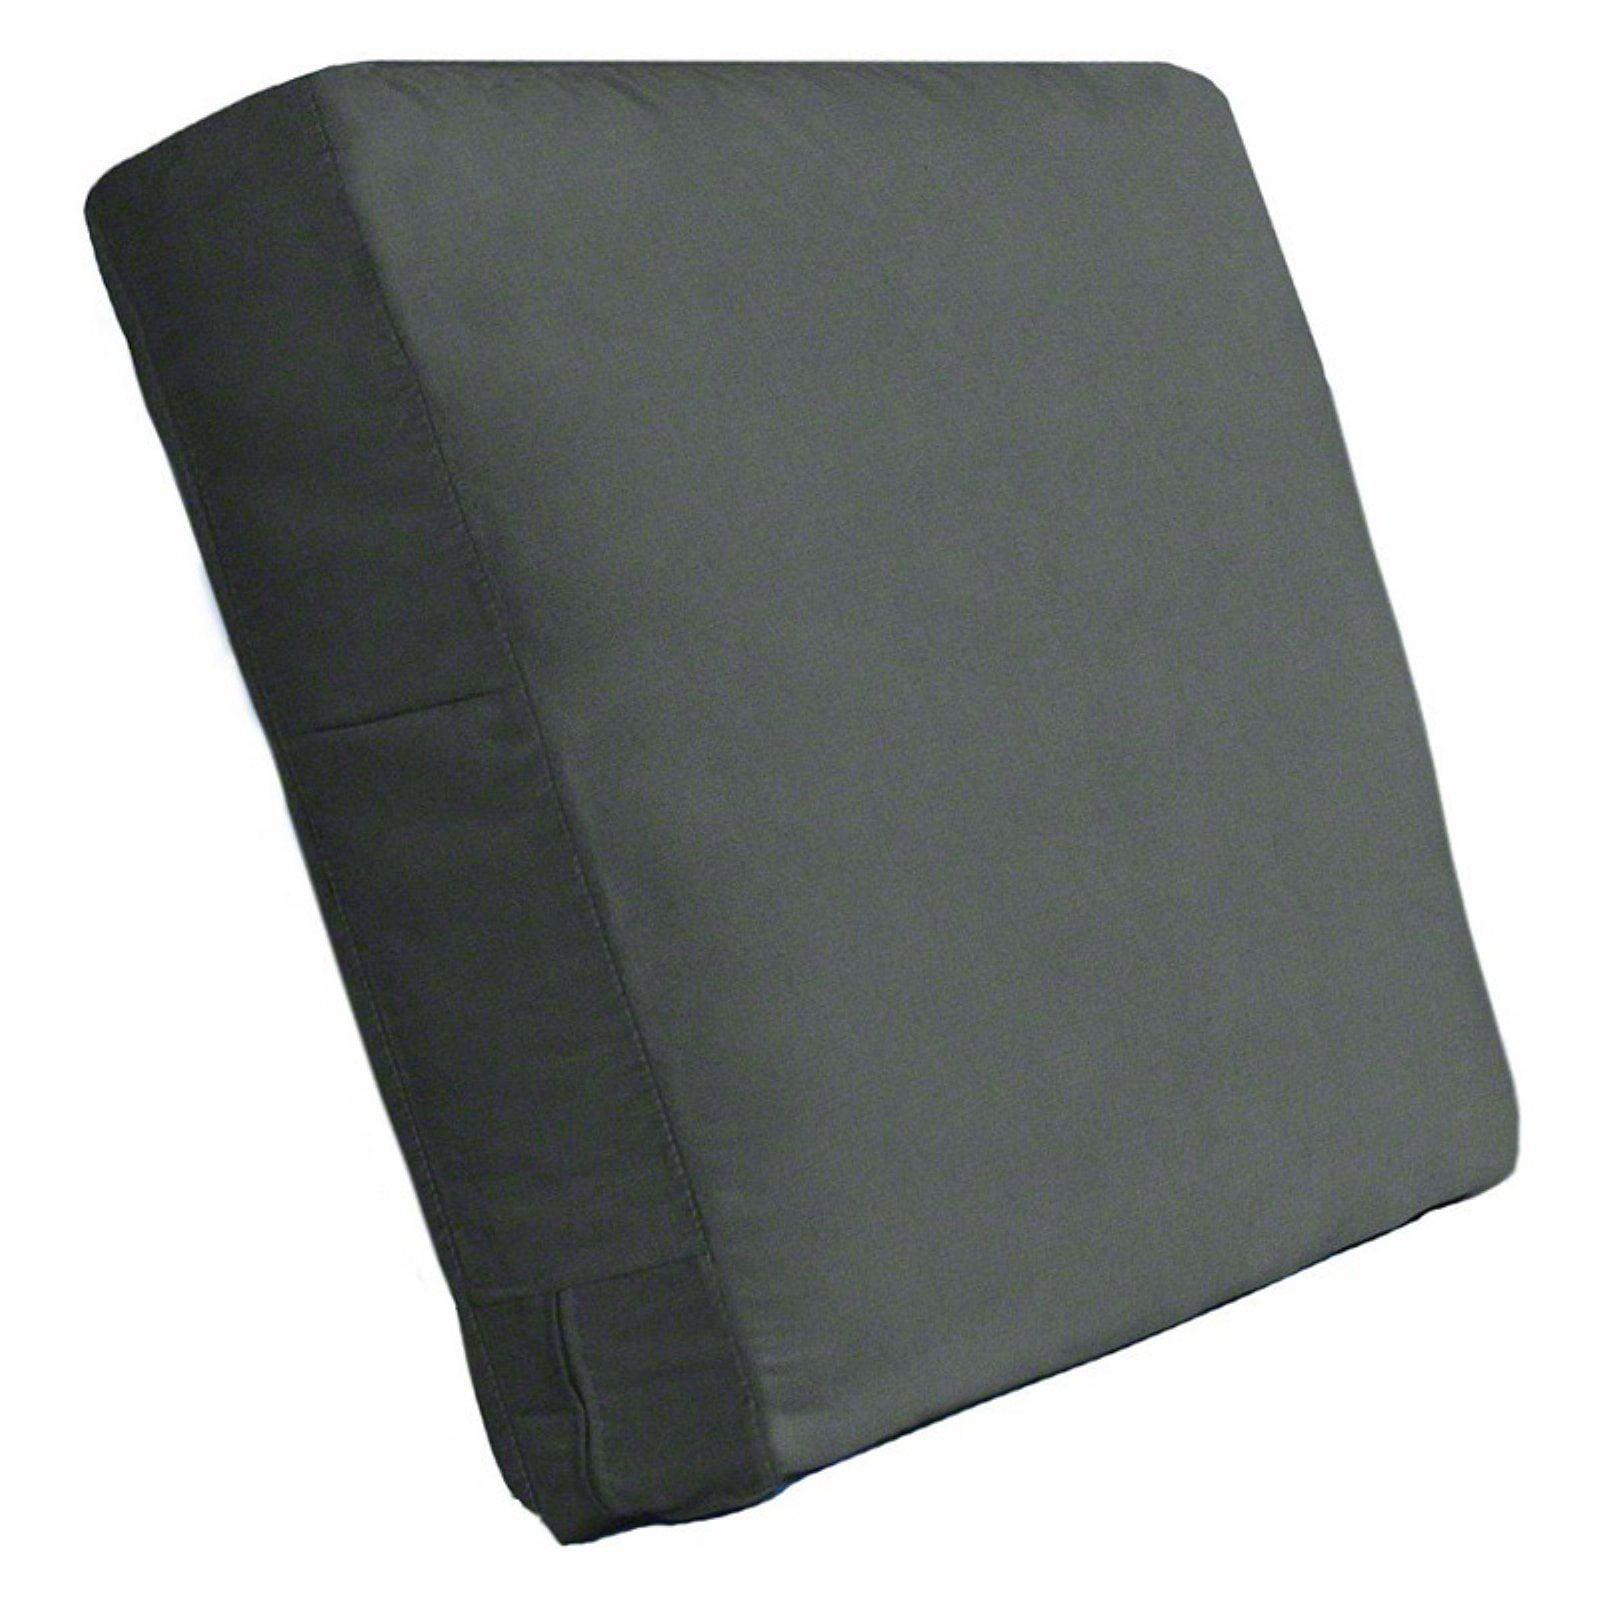 Cushion Source 25 X 19 In Solid Deep Seating Sunbrella Chair Back